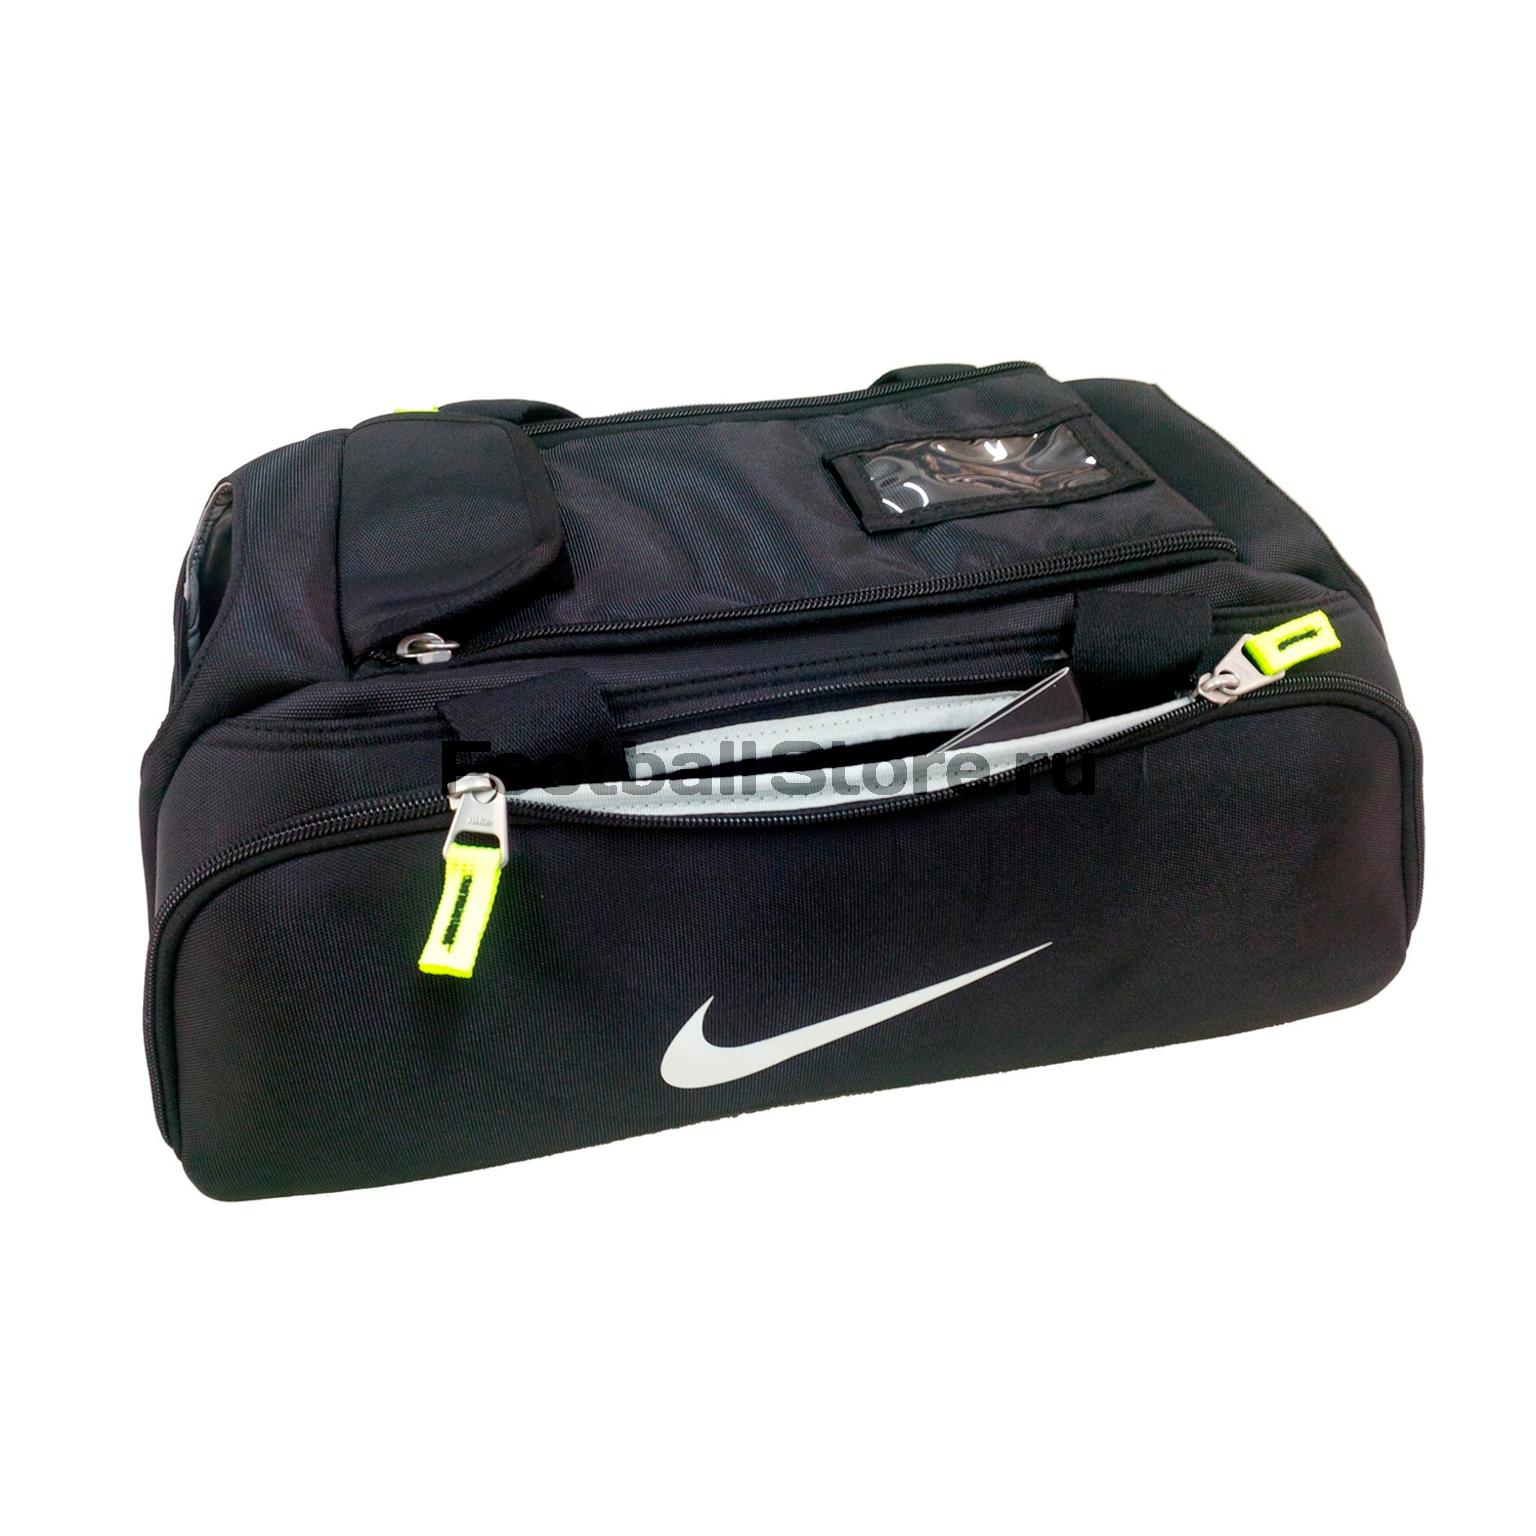 Фото - Сумка медицинская Nike Medical Bag 3.0 PBZ343-071 cow leather tote bag brand 2018 bolsa feminina new women handbag 100% genuine leather alligator shoulder bag free shipping